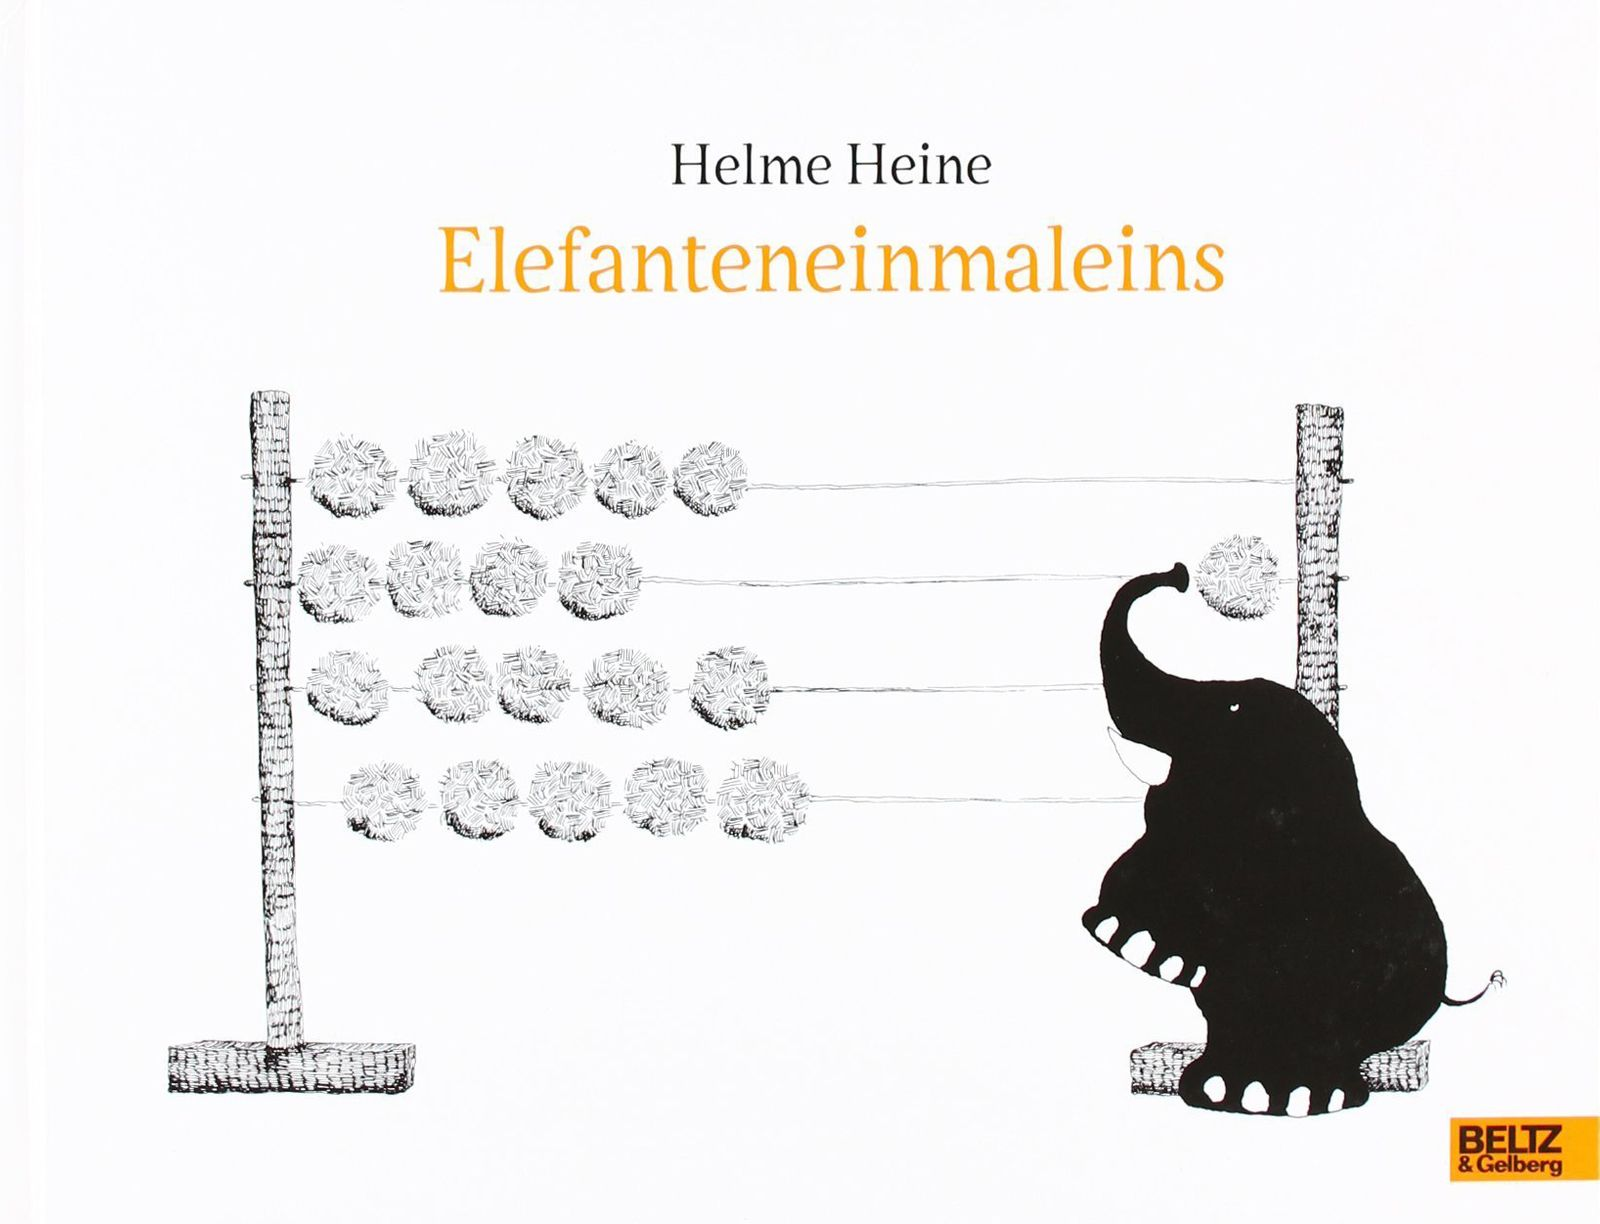 Helme Heine